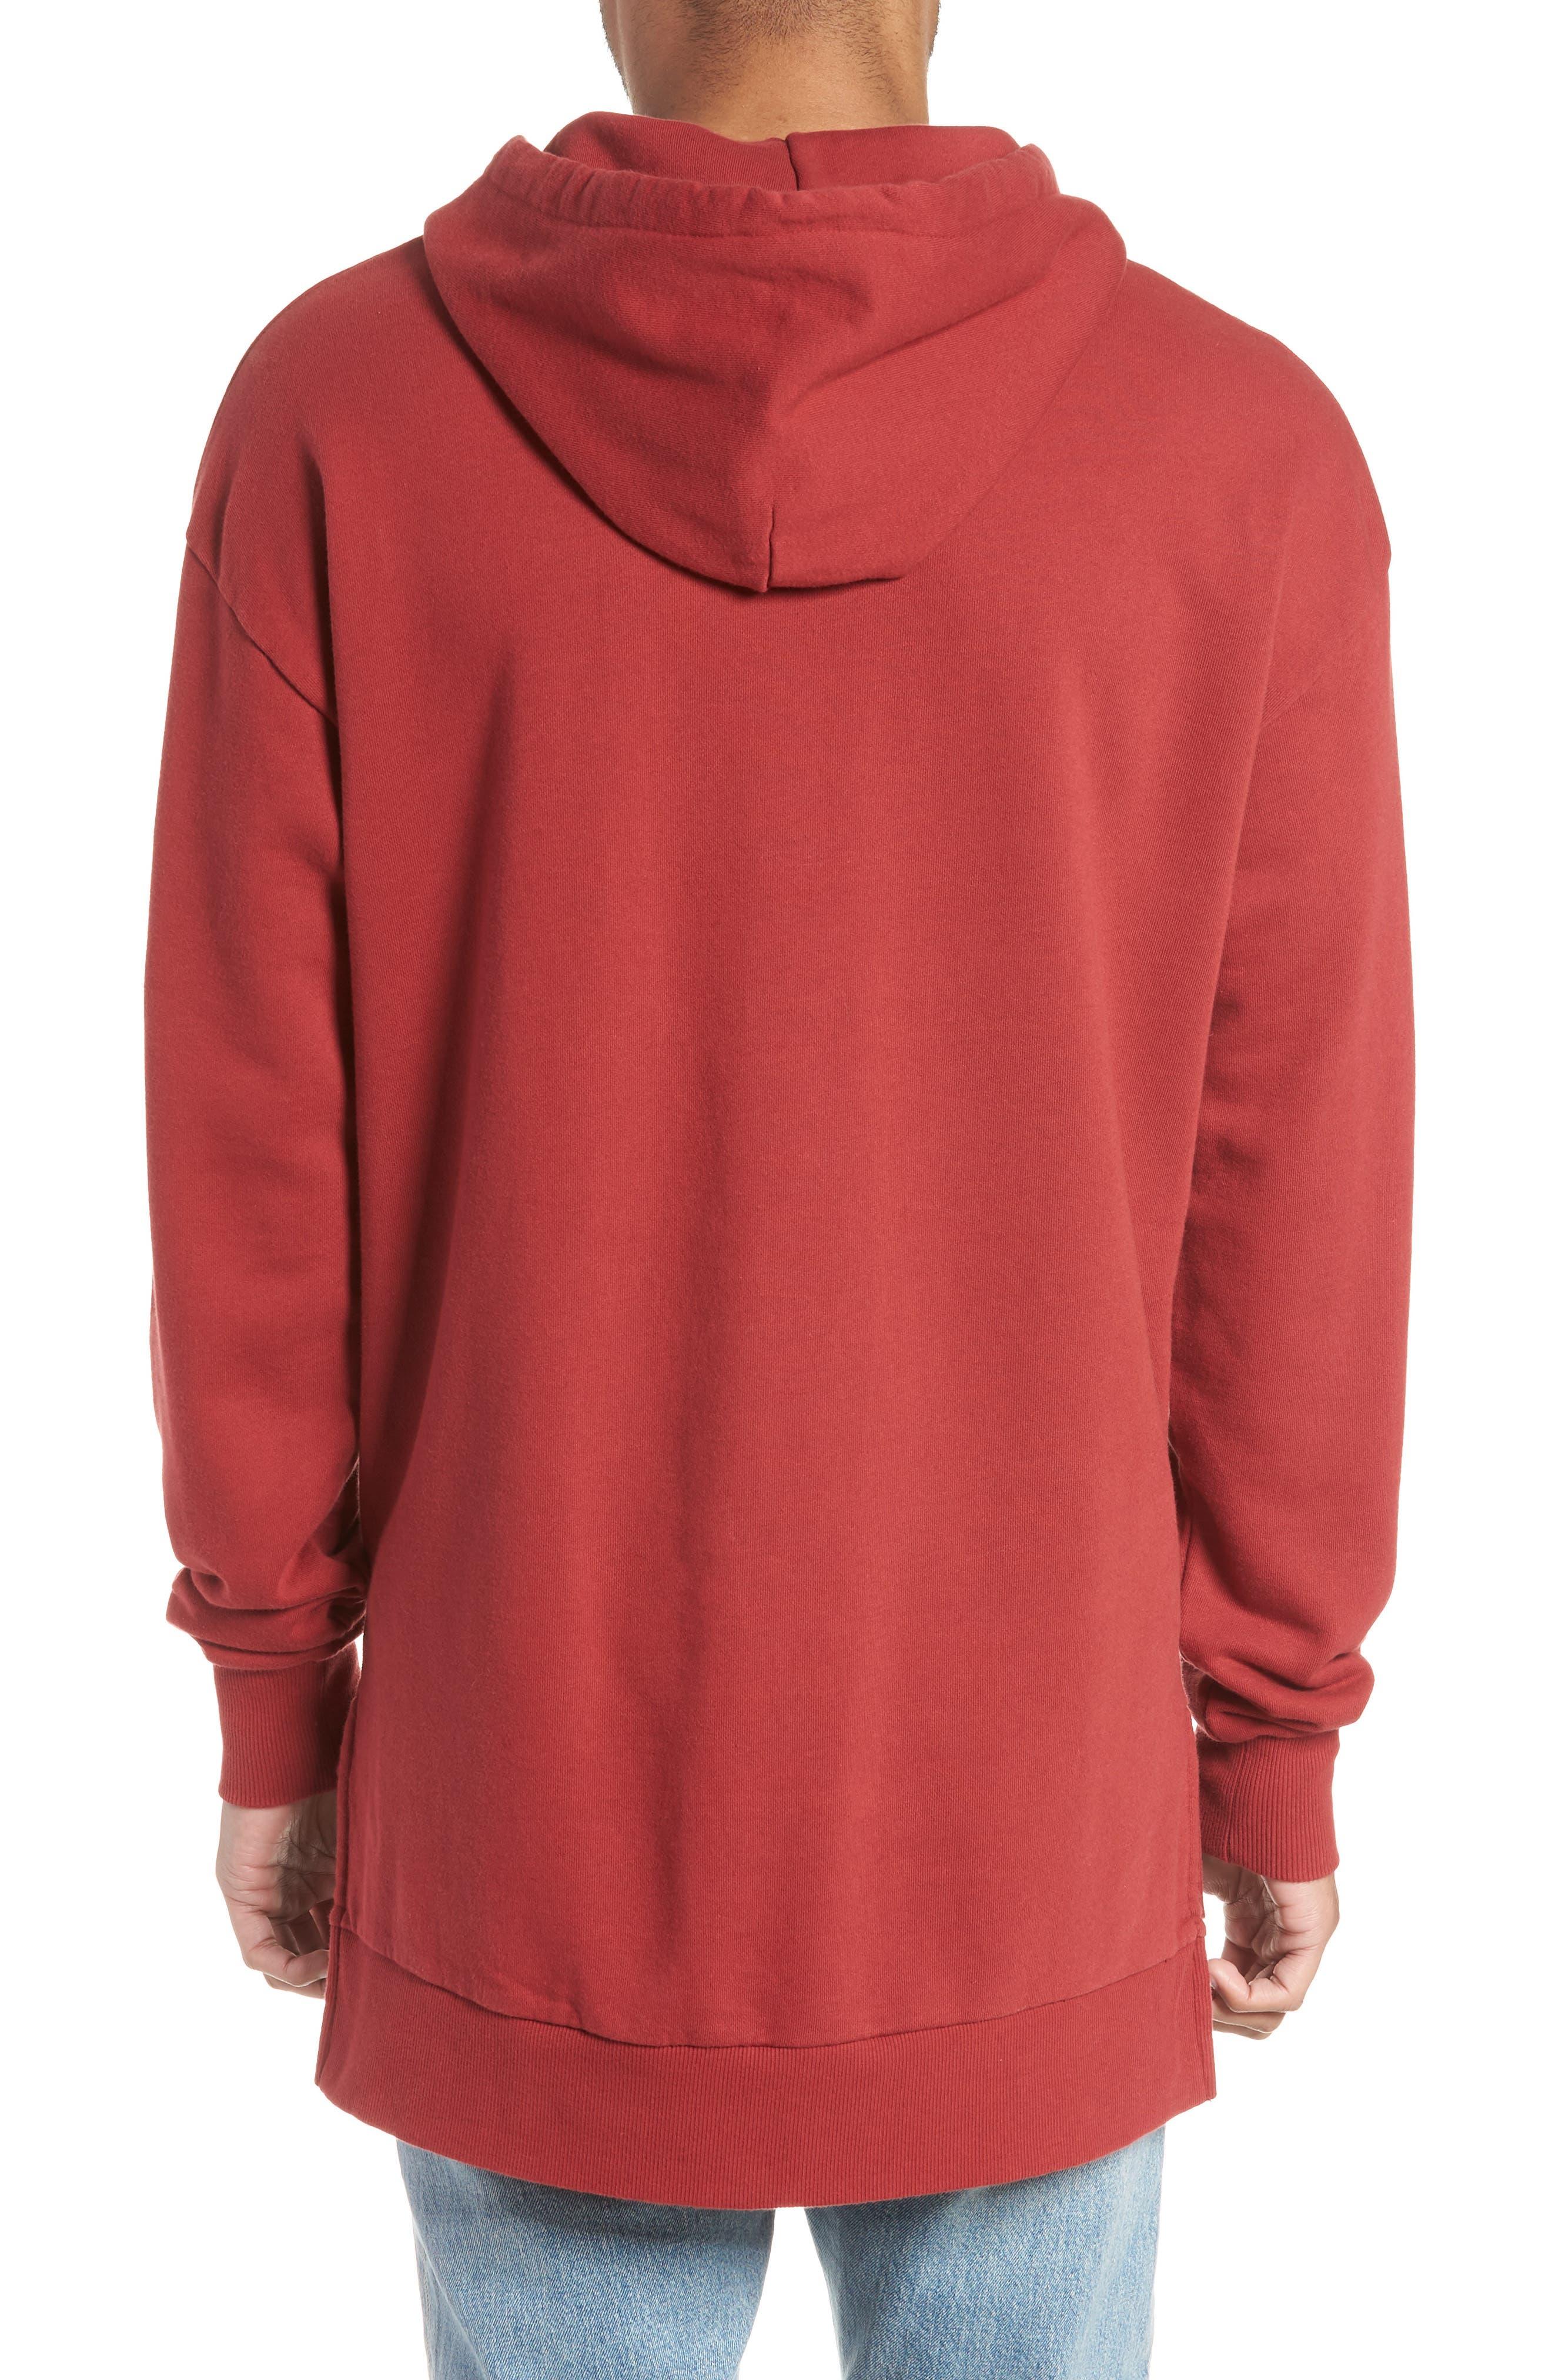 Rugger Hooded Sweatshirt,                             Alternate thumbnail 2, color,                             Dark Cherry